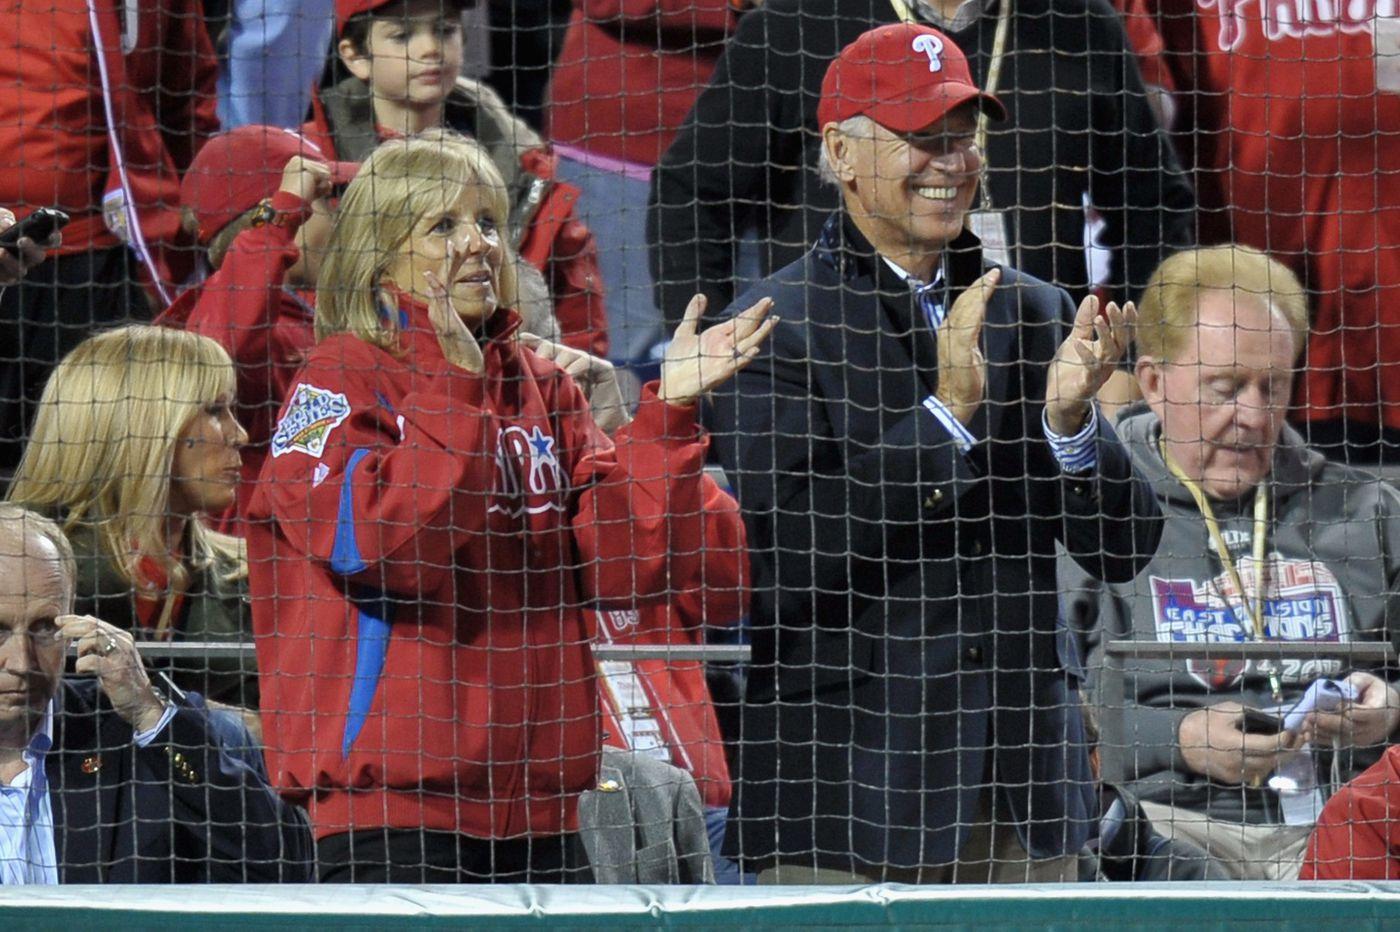 Phillies fan Joe Biden won't be the first president tied to Philadelphia baseball | Extra Innings